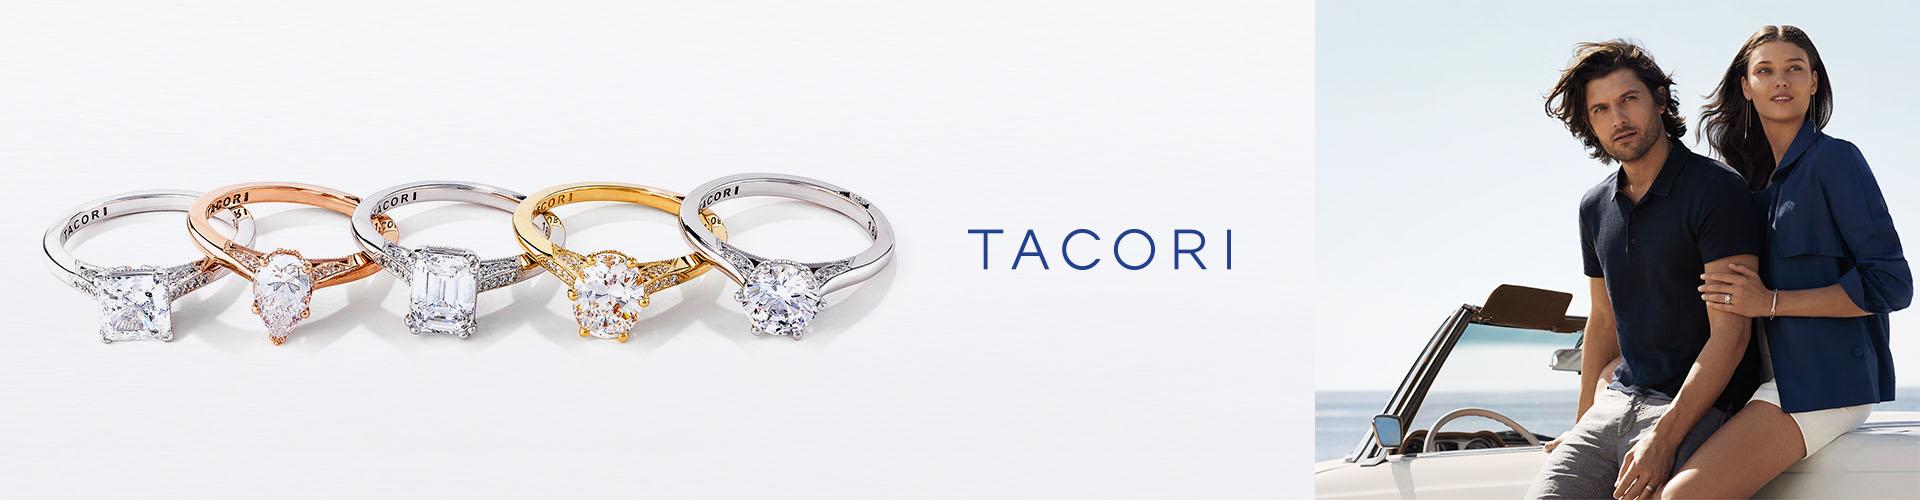 Simply Tacori Collection